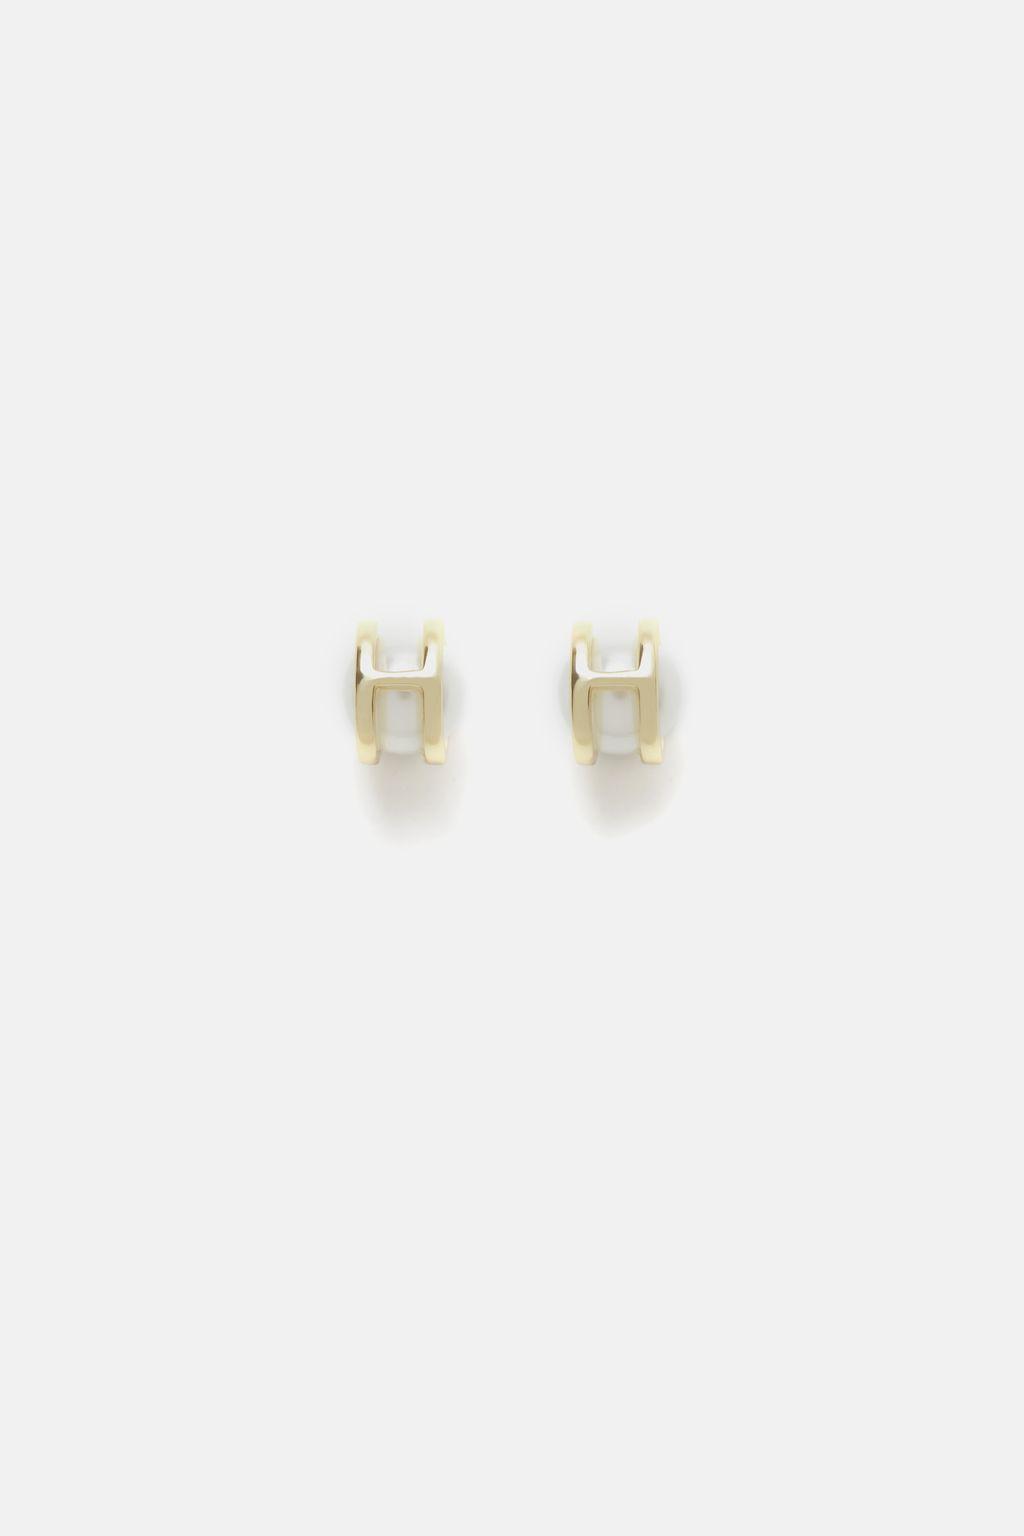 Insignia Pearl earrings